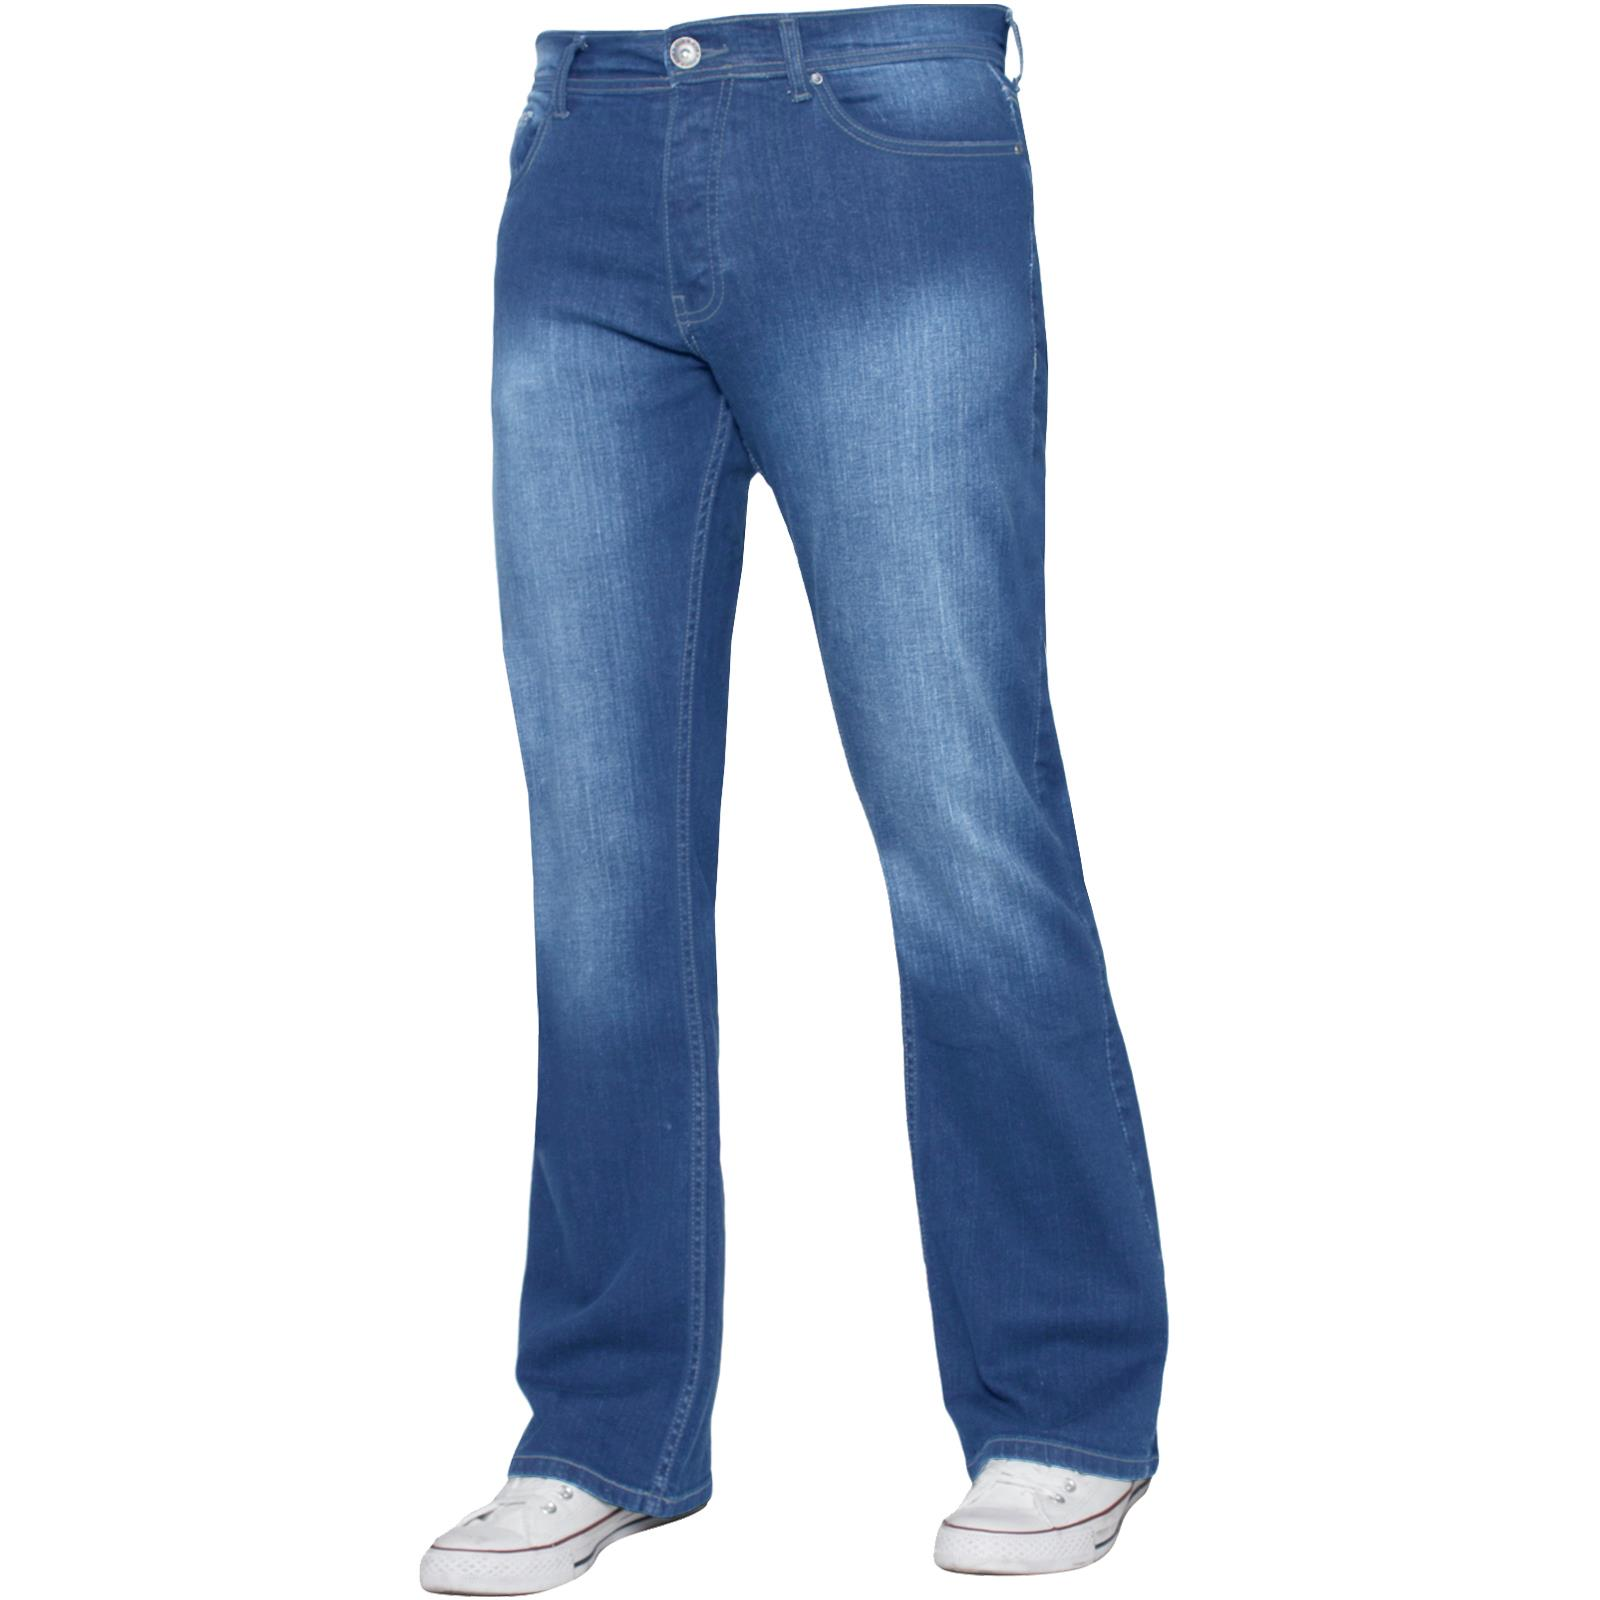 Para-Hombre-Recto-Bootcut-Stretch-Jeans-Pantalones-Regular-Fit-Grande-Alto-Todas-Cinturas miniatura 41